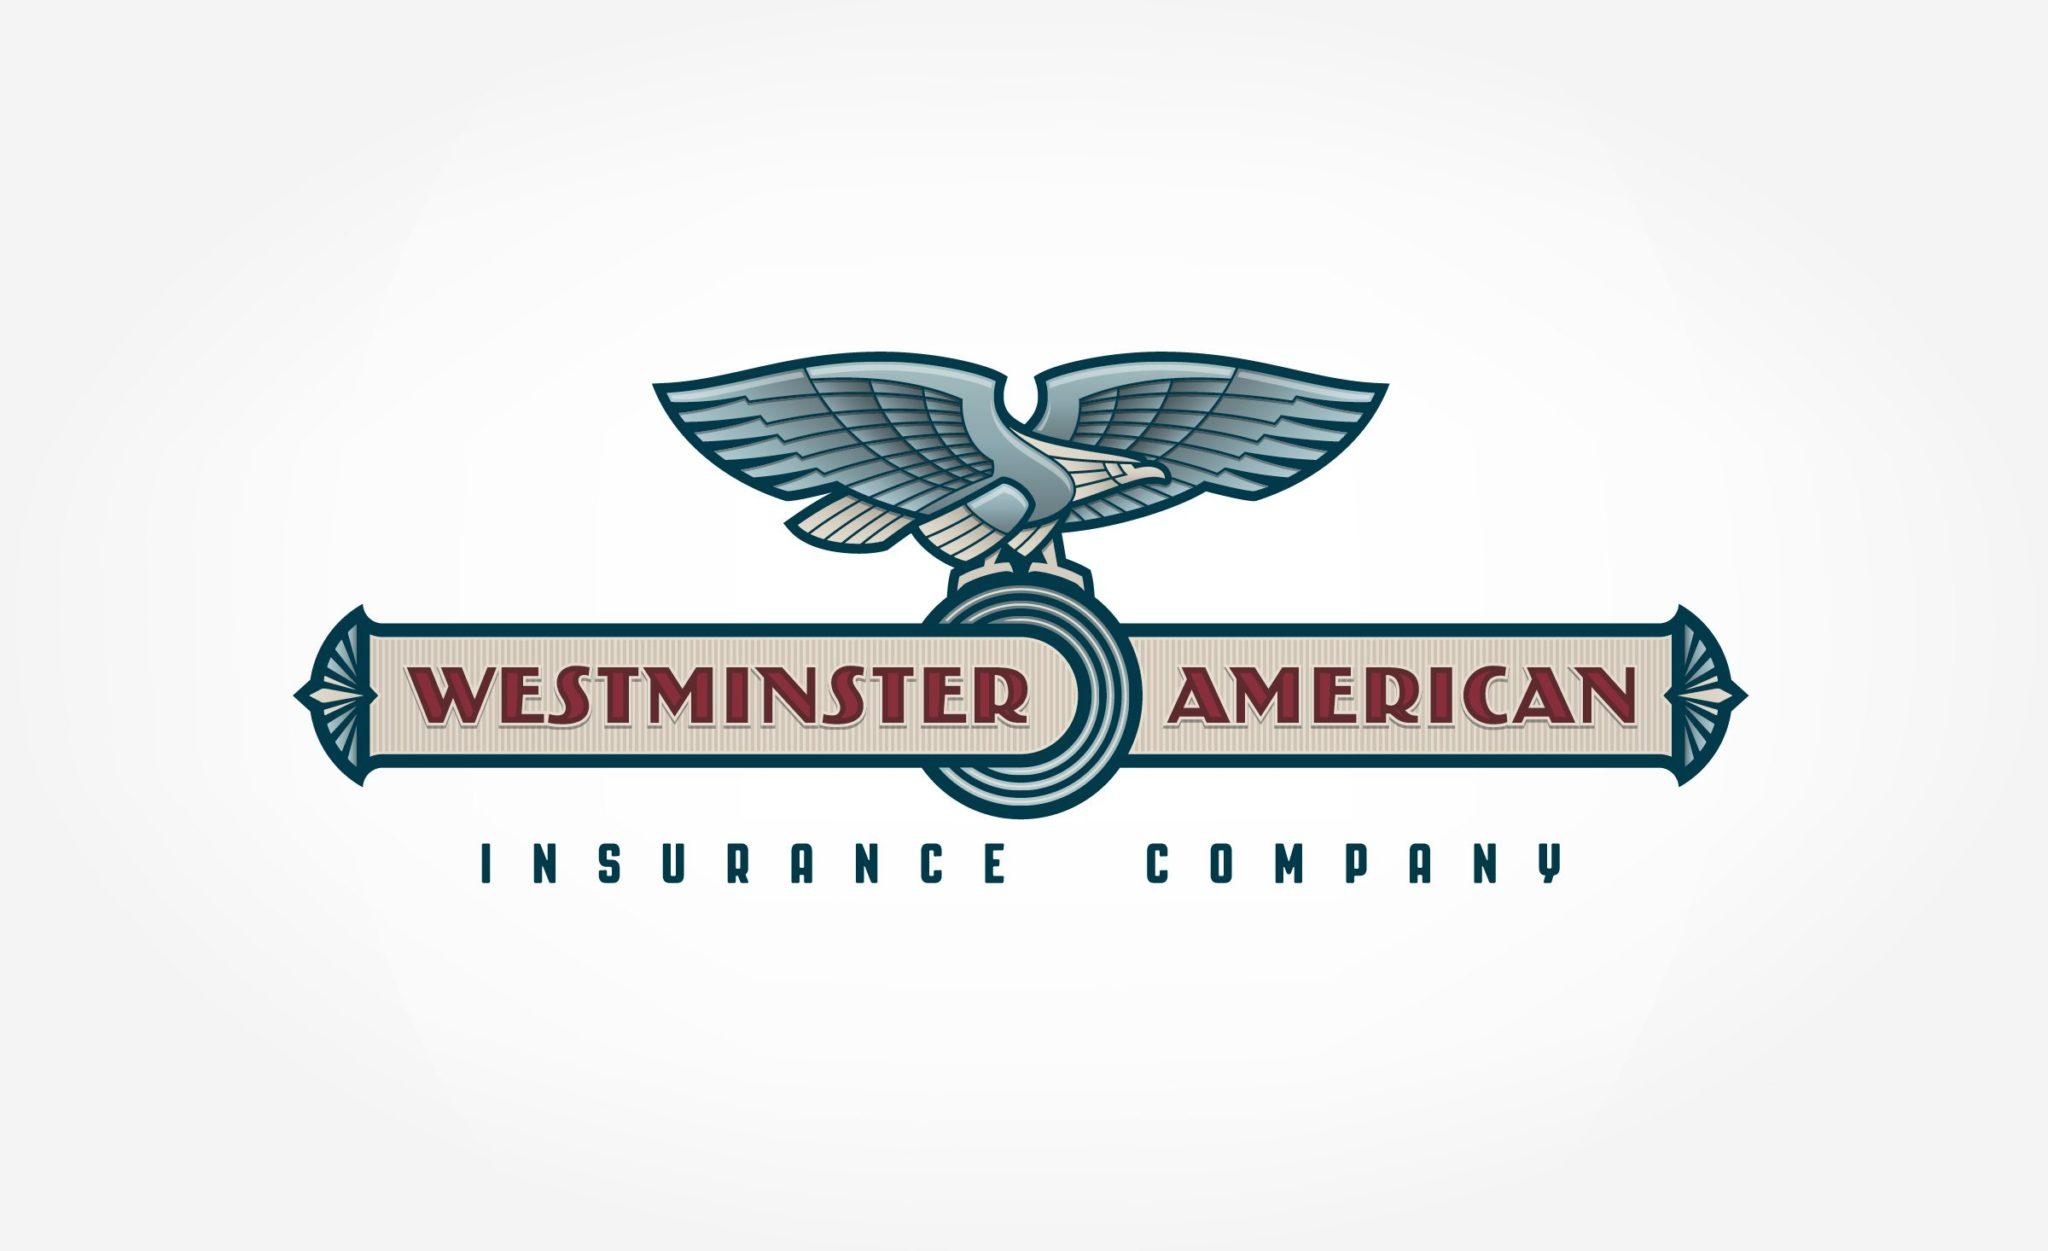 Westminster American